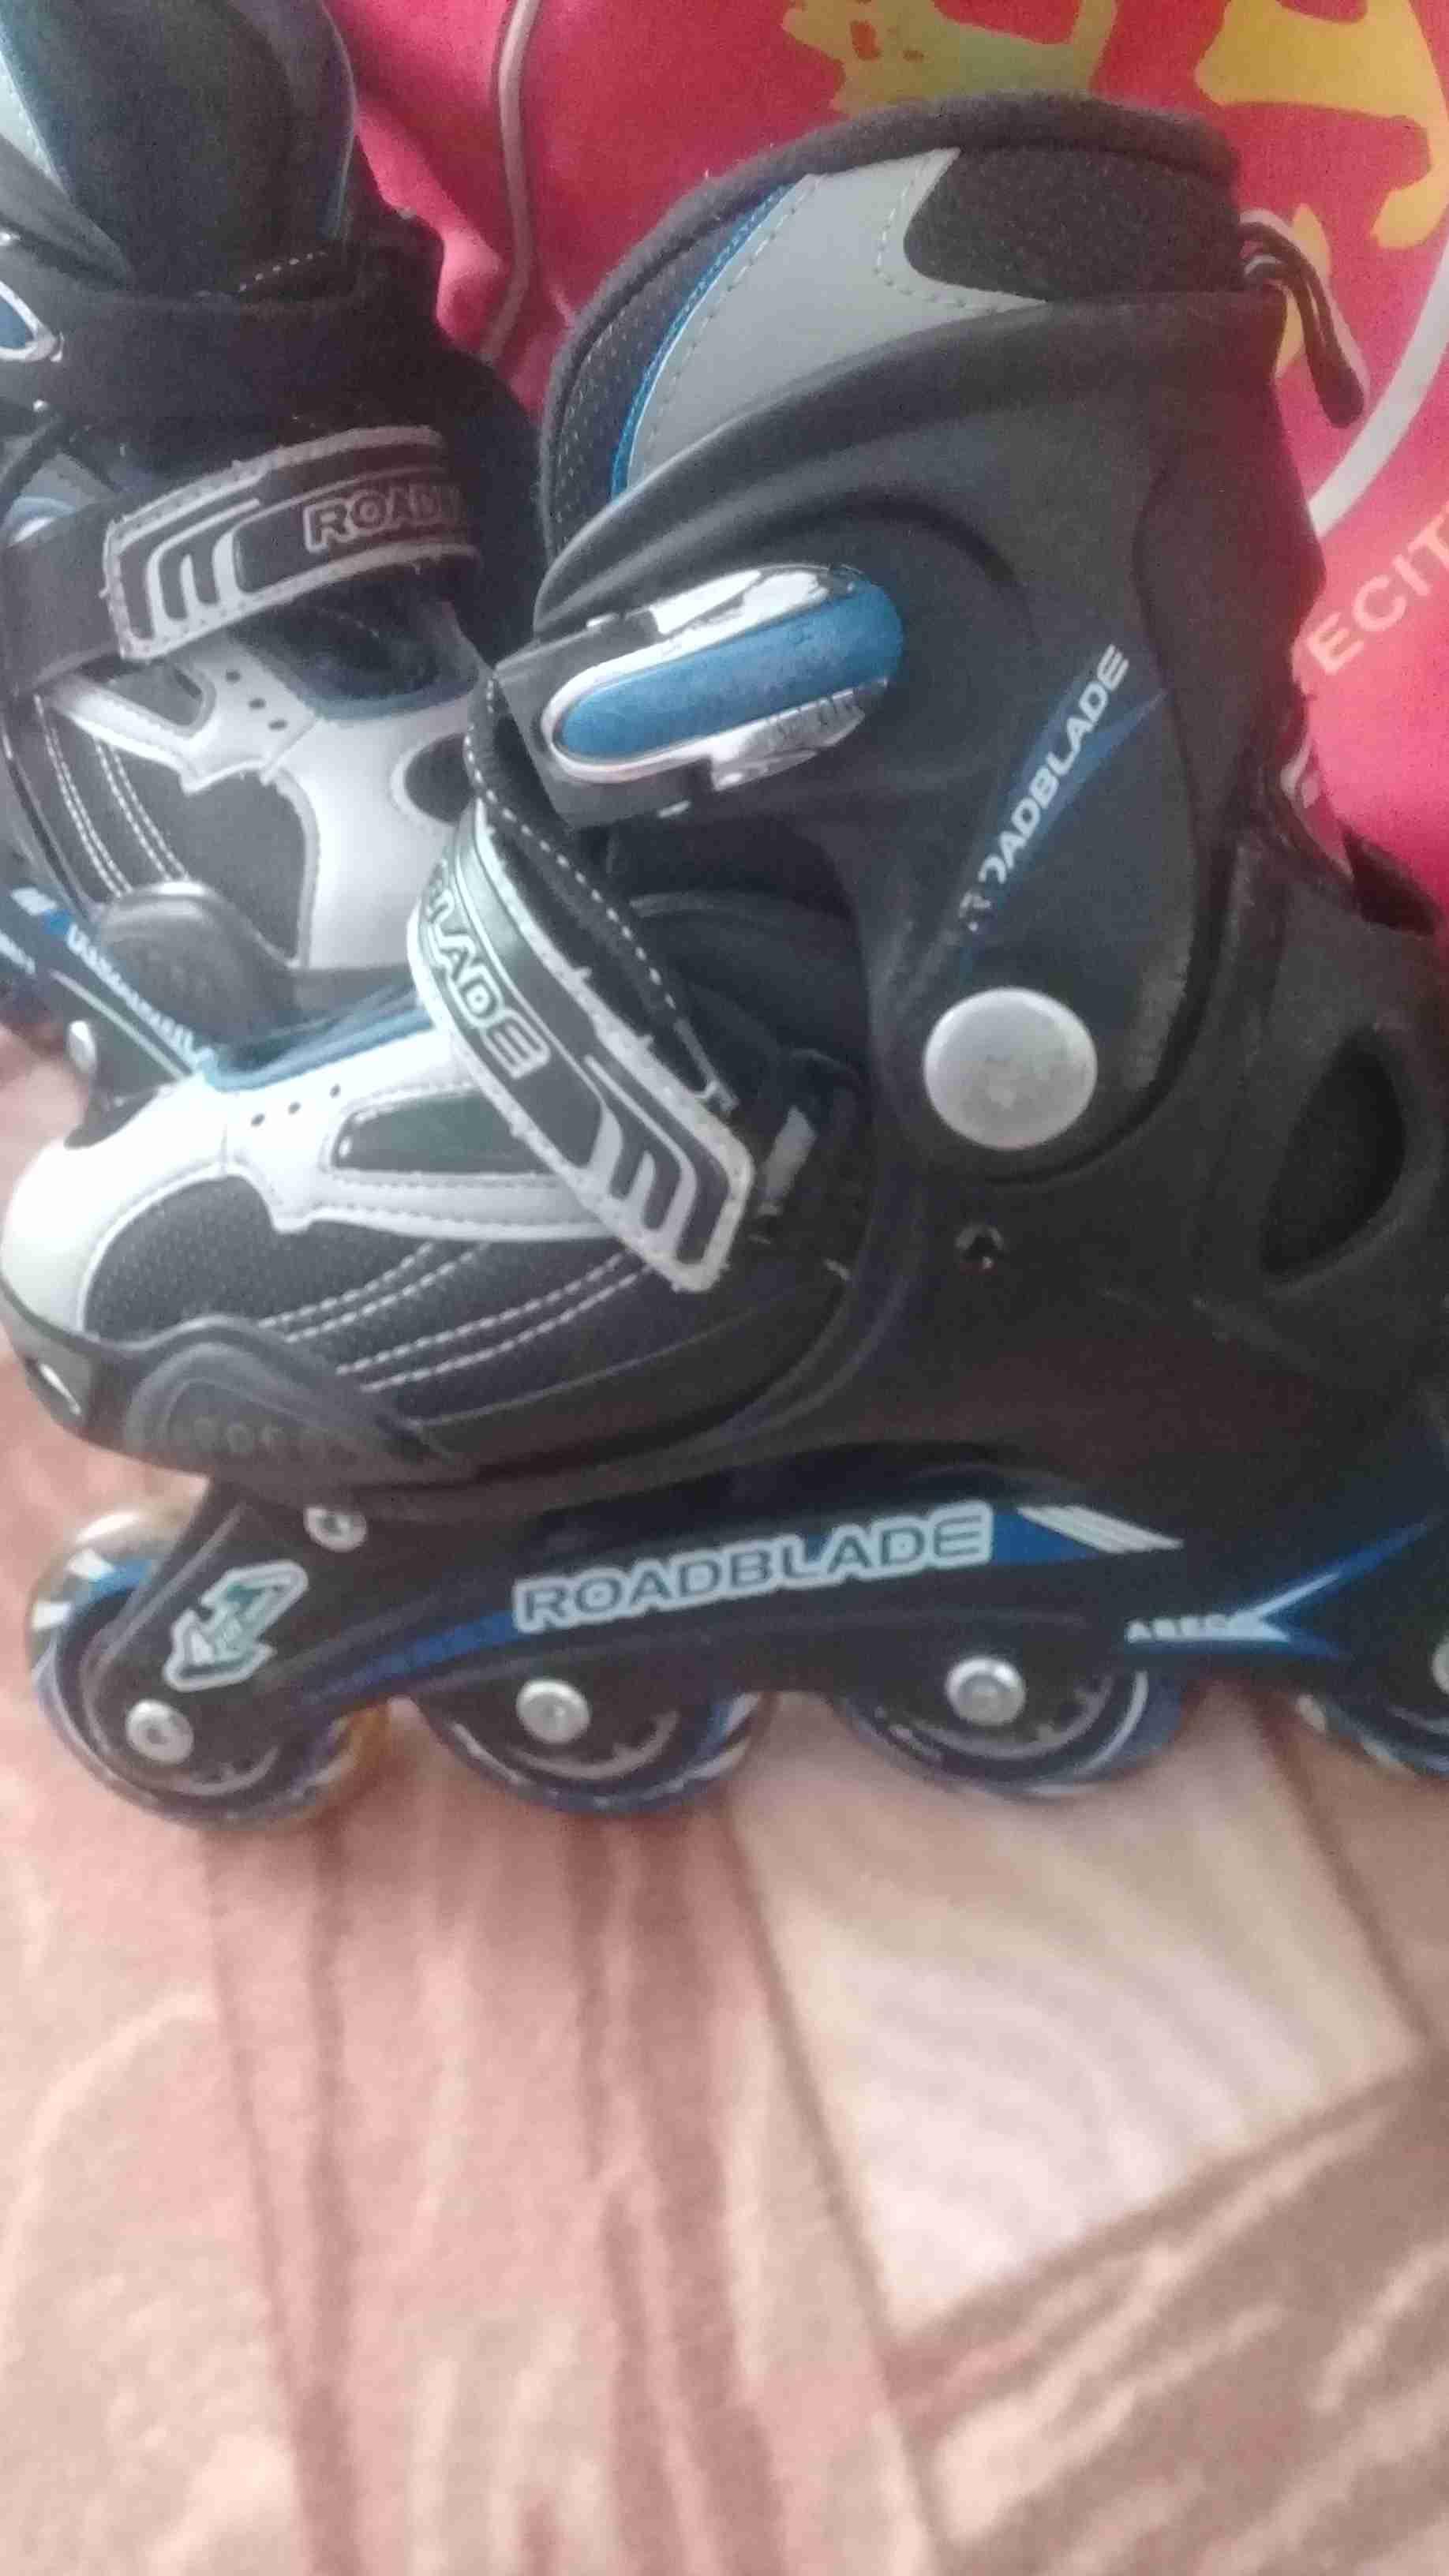 فروش کفش اسکیت ROAD BADE ایتالیا